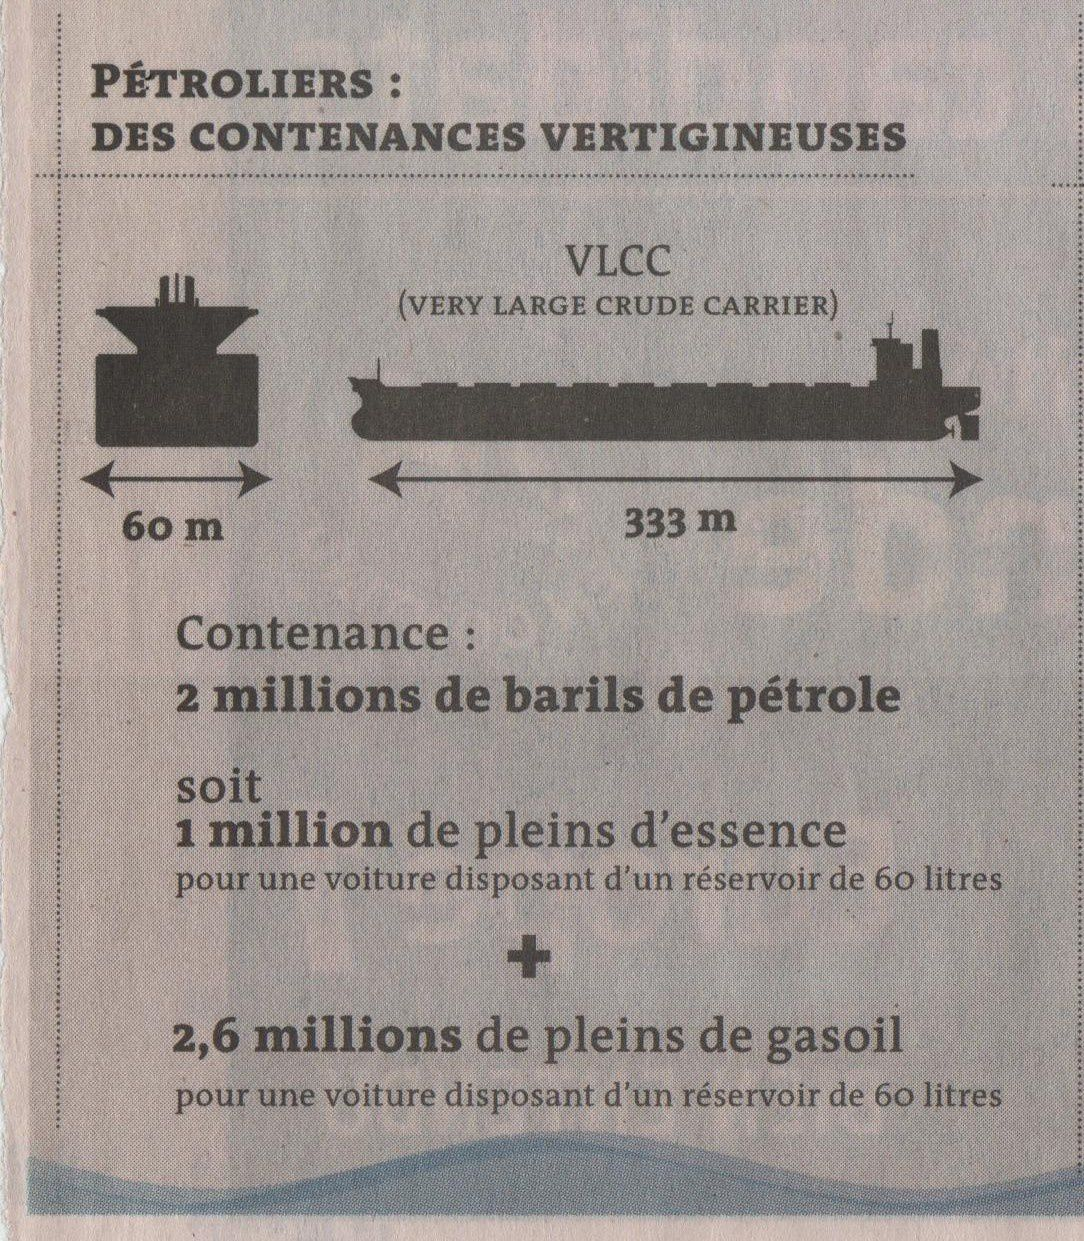 Mers et Océans - documents 1